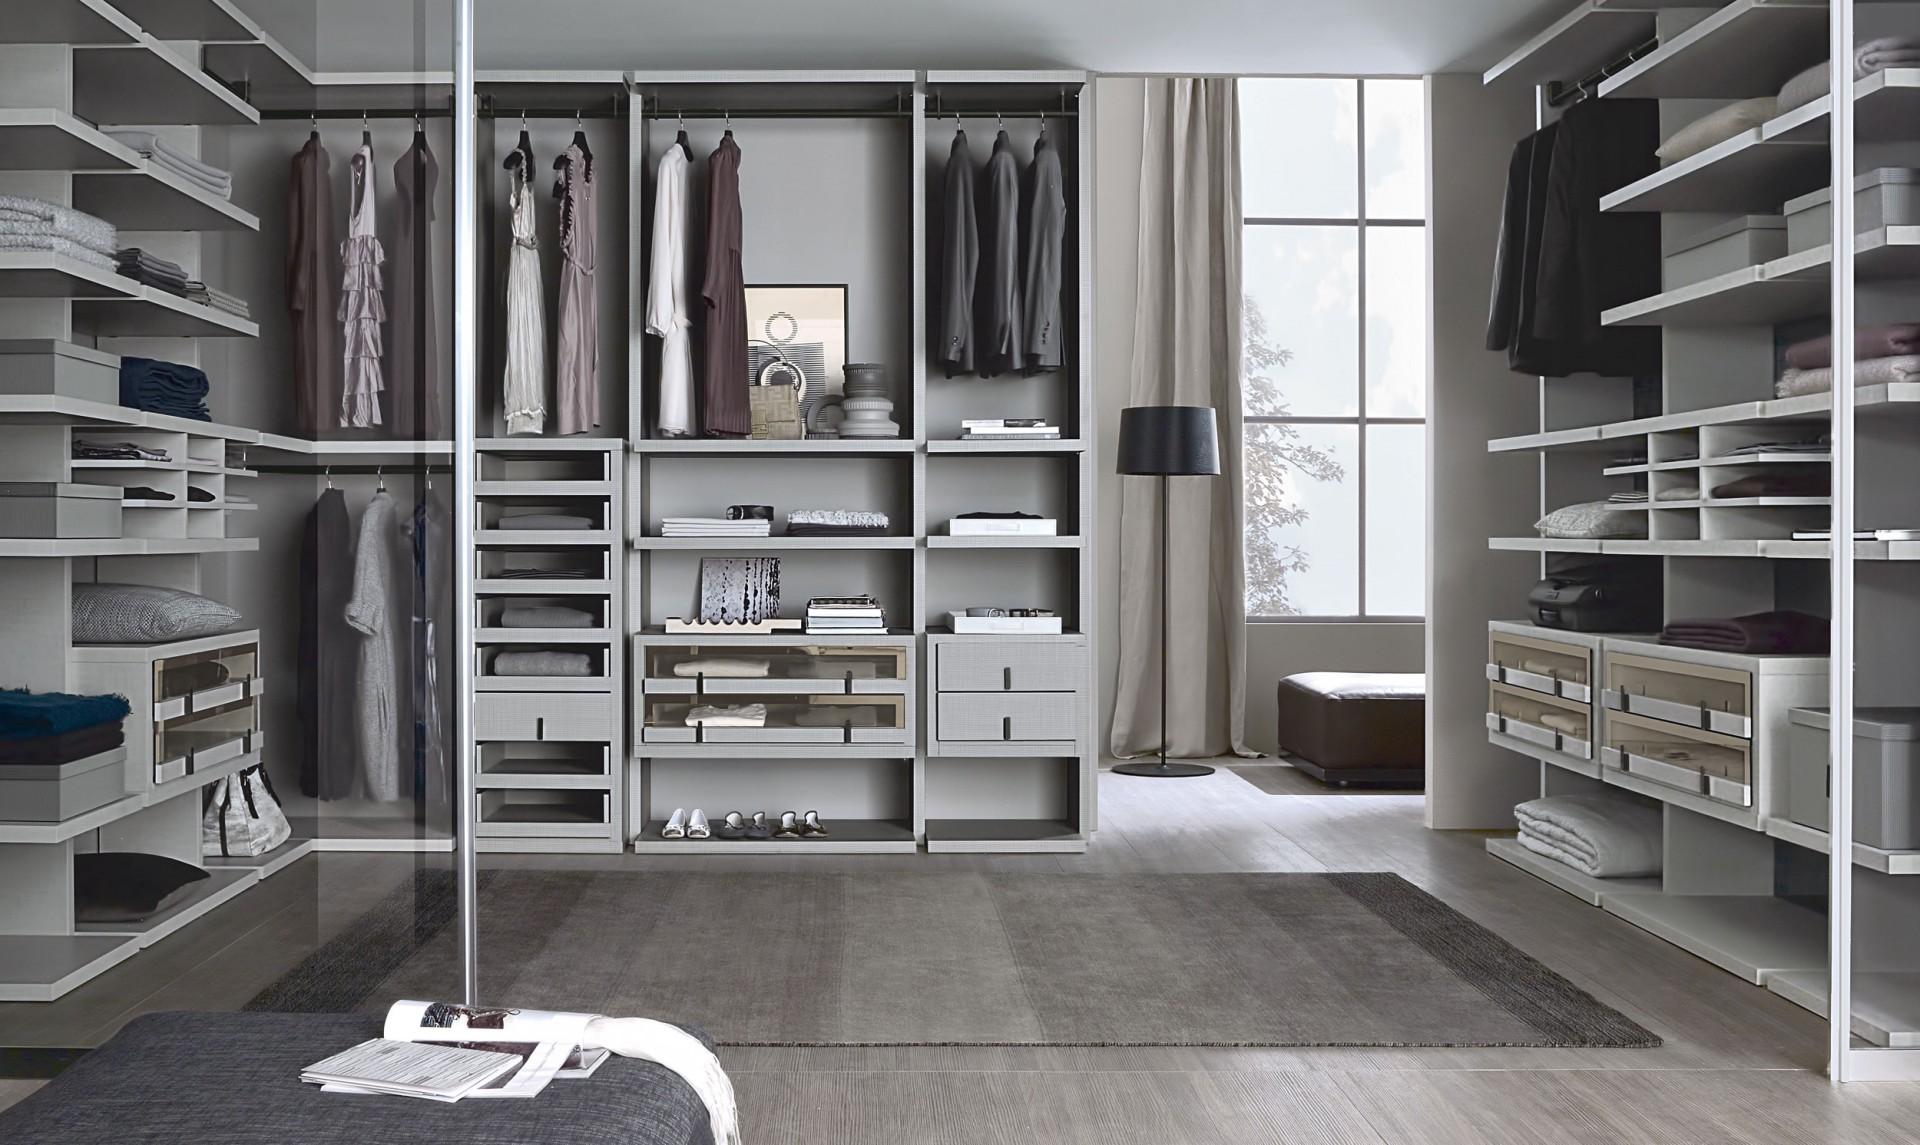 06-millimetrica-closet-system-misuraemme-2.jpg